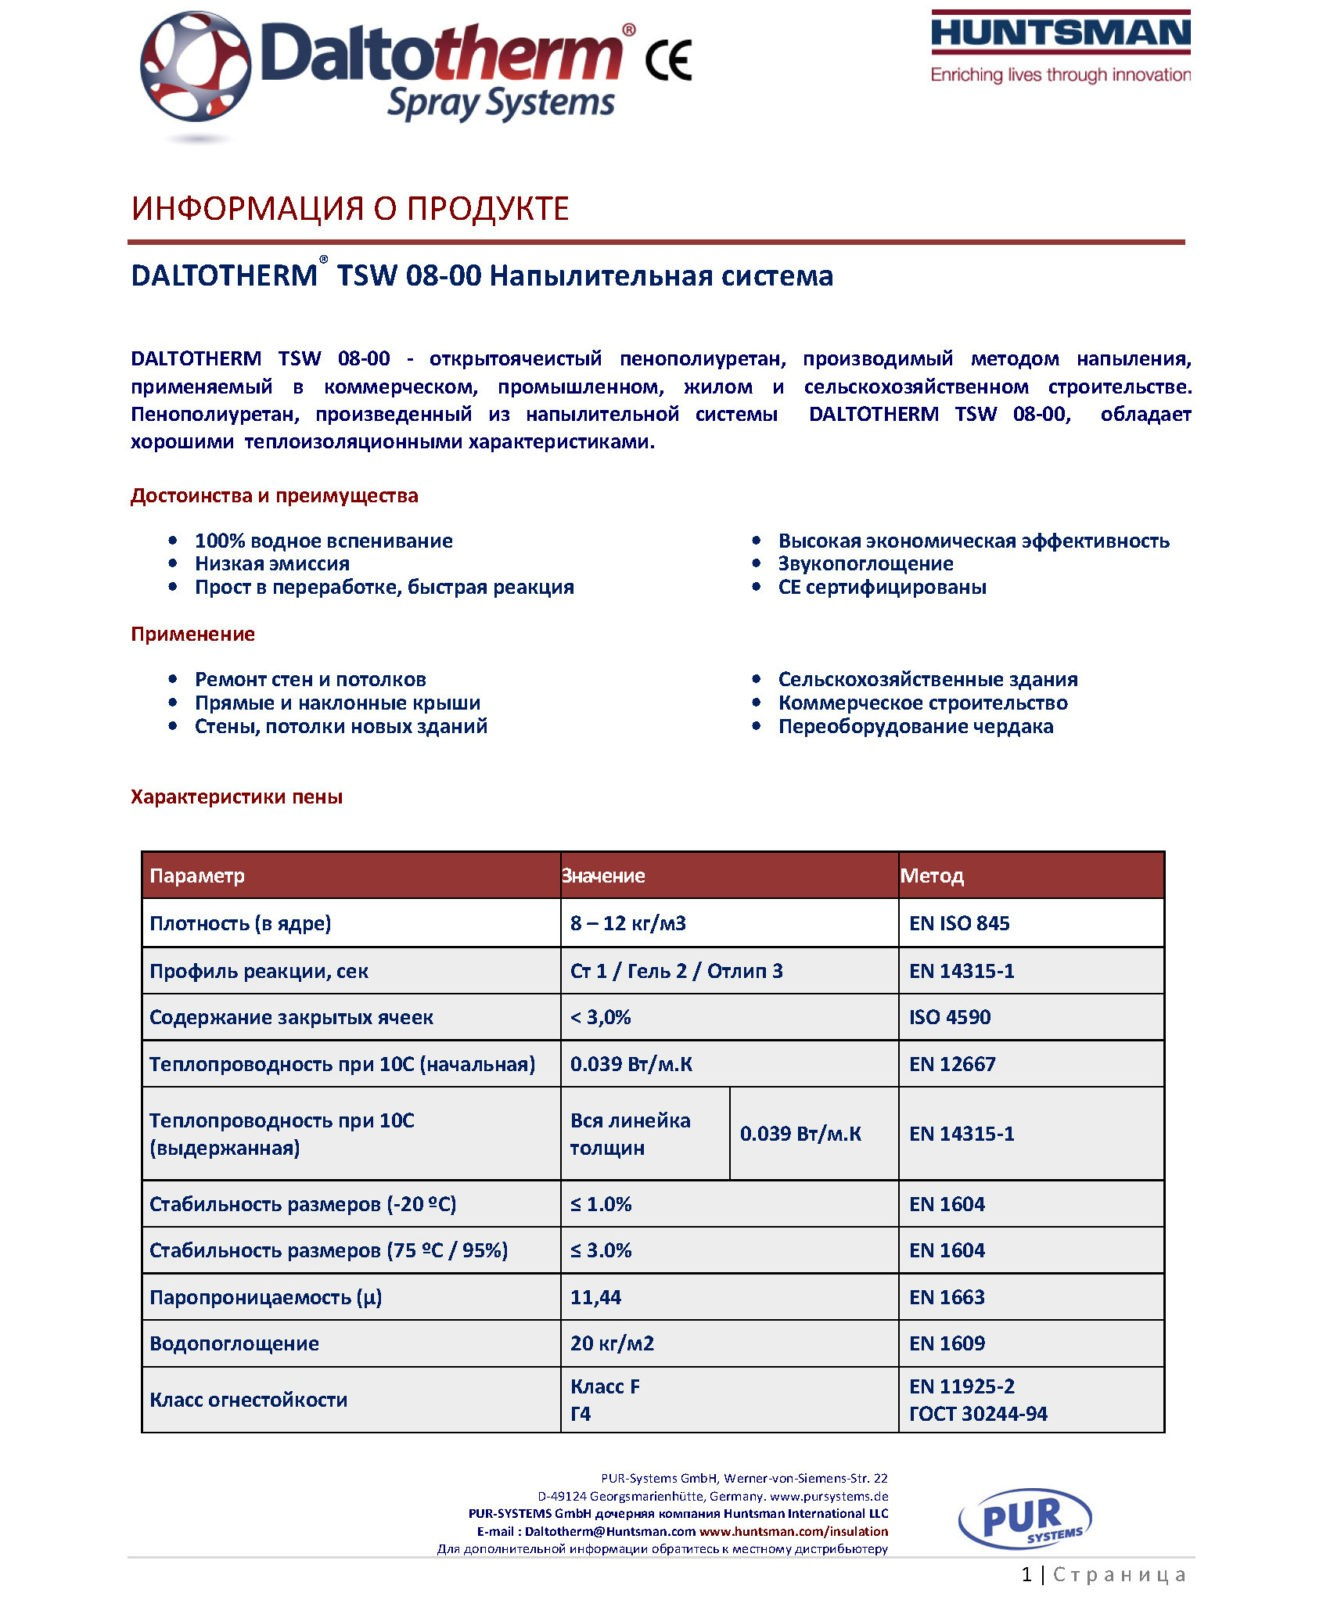 Daltotherm_TSW_08-00 компоненты Huntsman NMG Ханстман_Страница_1